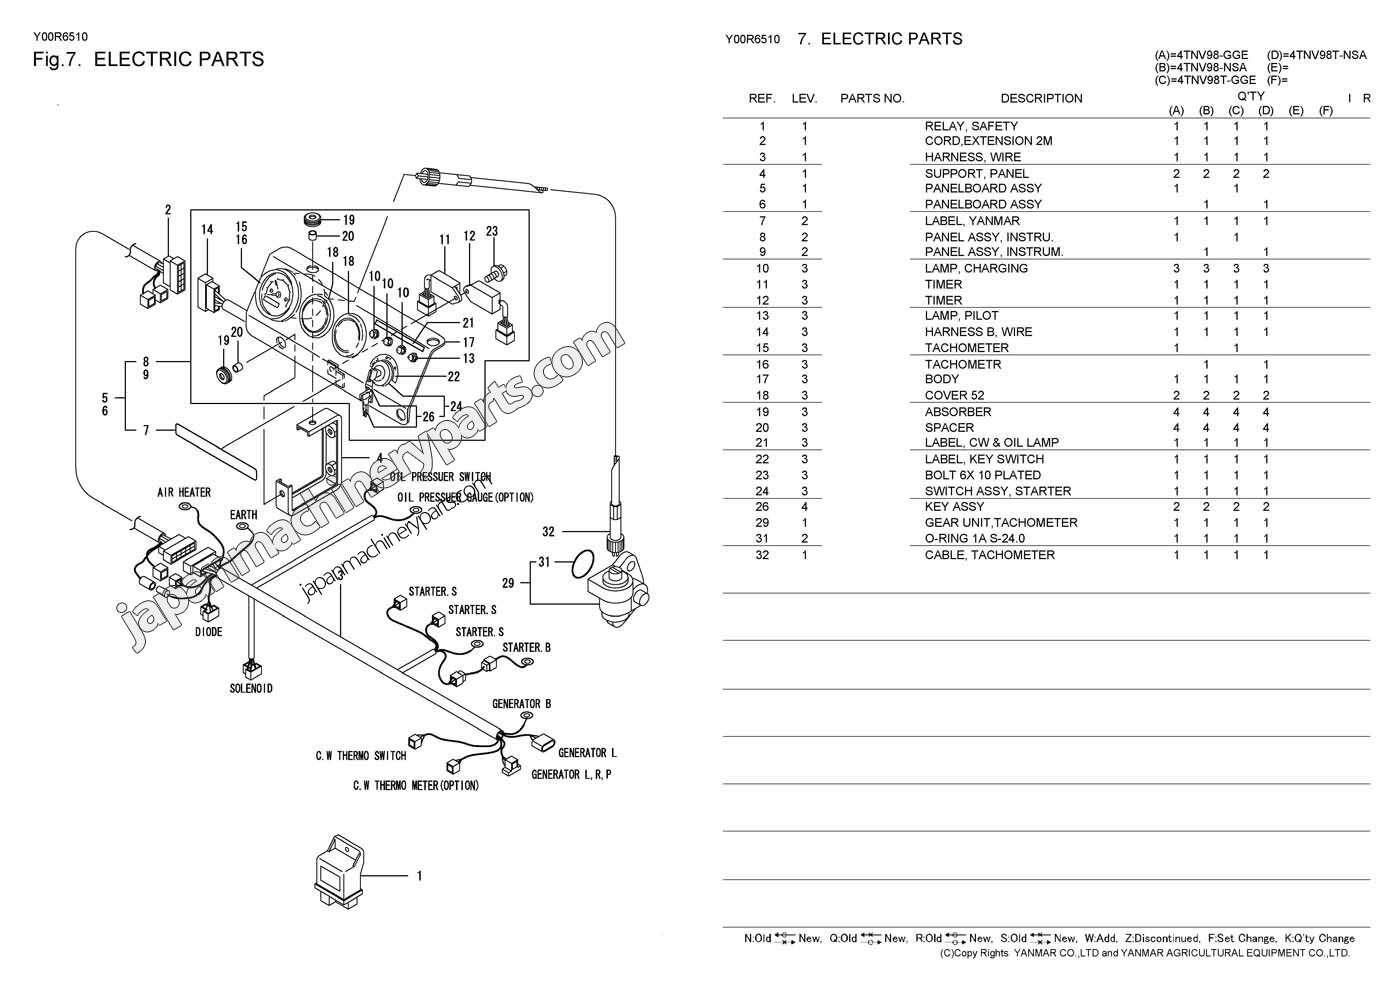 hight resolution of yanmar 4tnv wiring diagrams wiring diagram forward yanmar 4tnv88 wiring diagram yanmar 4tnv wiring diagrams